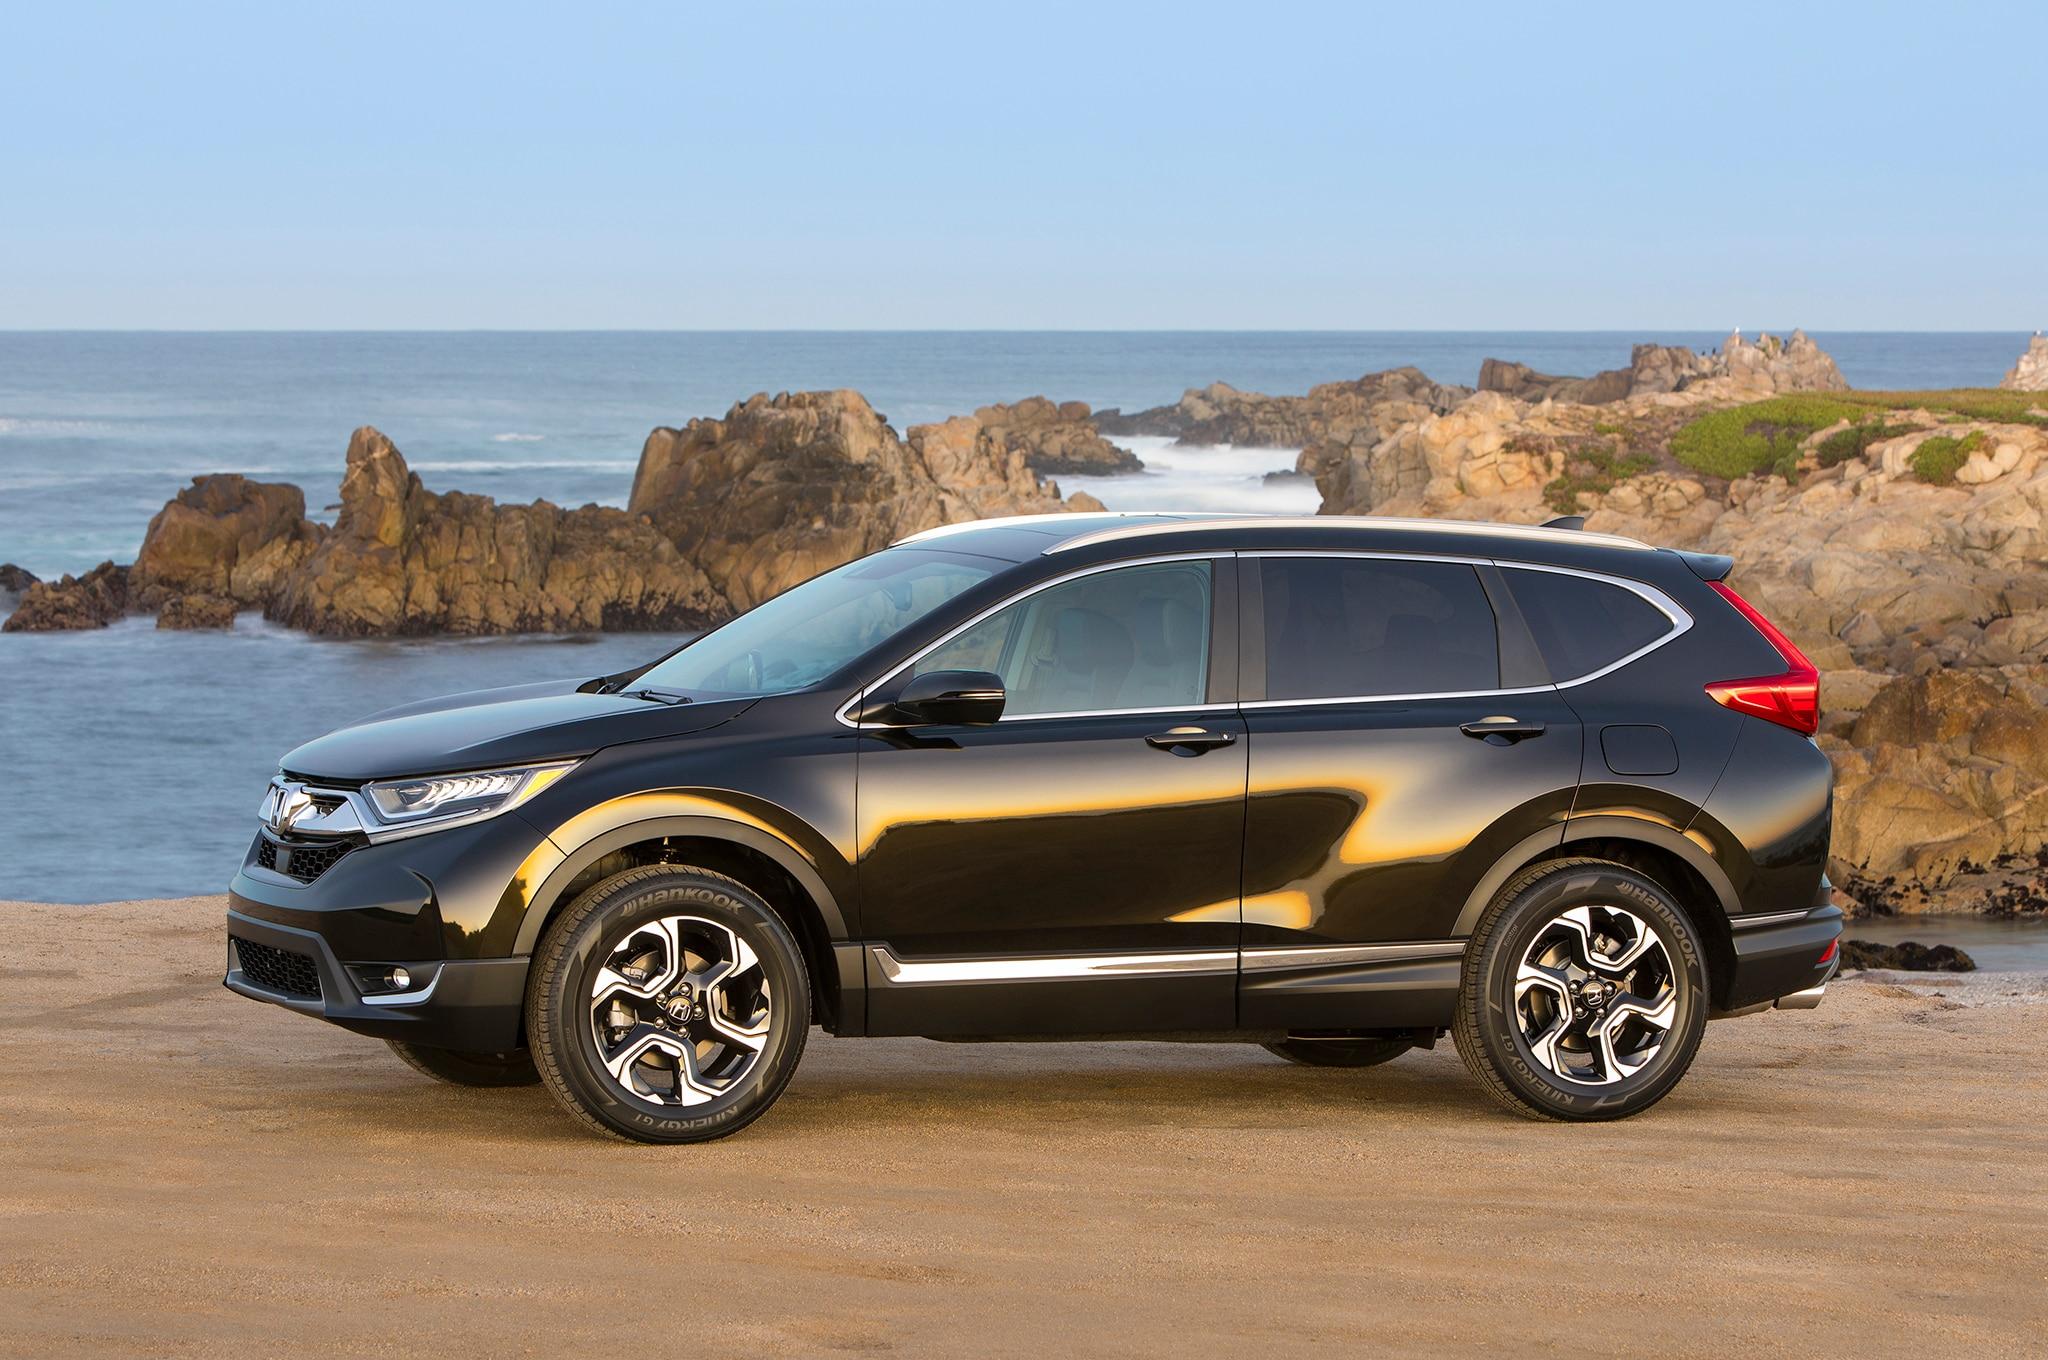 Honda accord 2018 y honda cr v 2018 cu l elegir motor for Honda crv vs accord